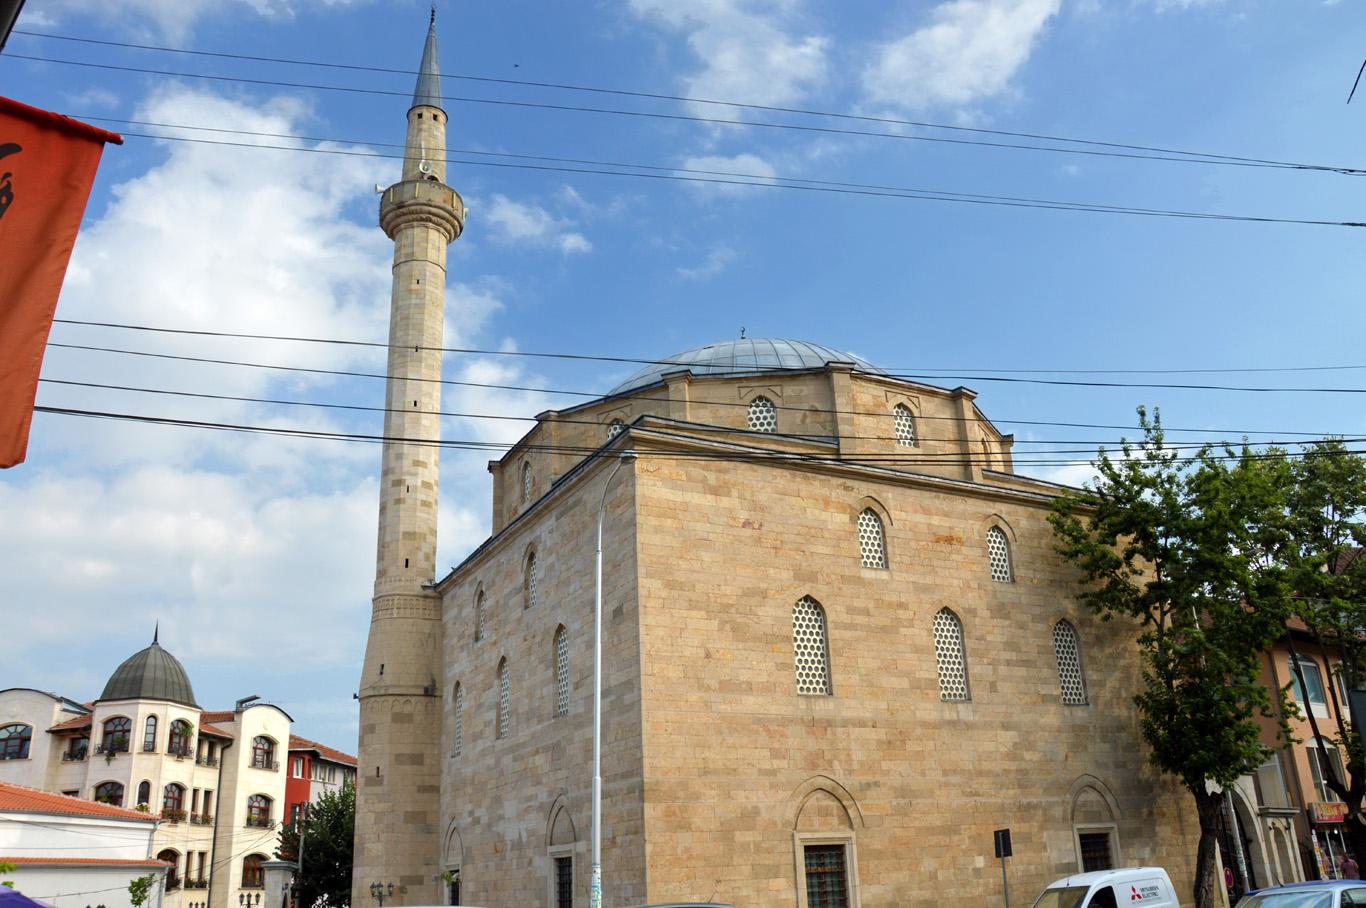 Sultan Mehmet Faith Mosque